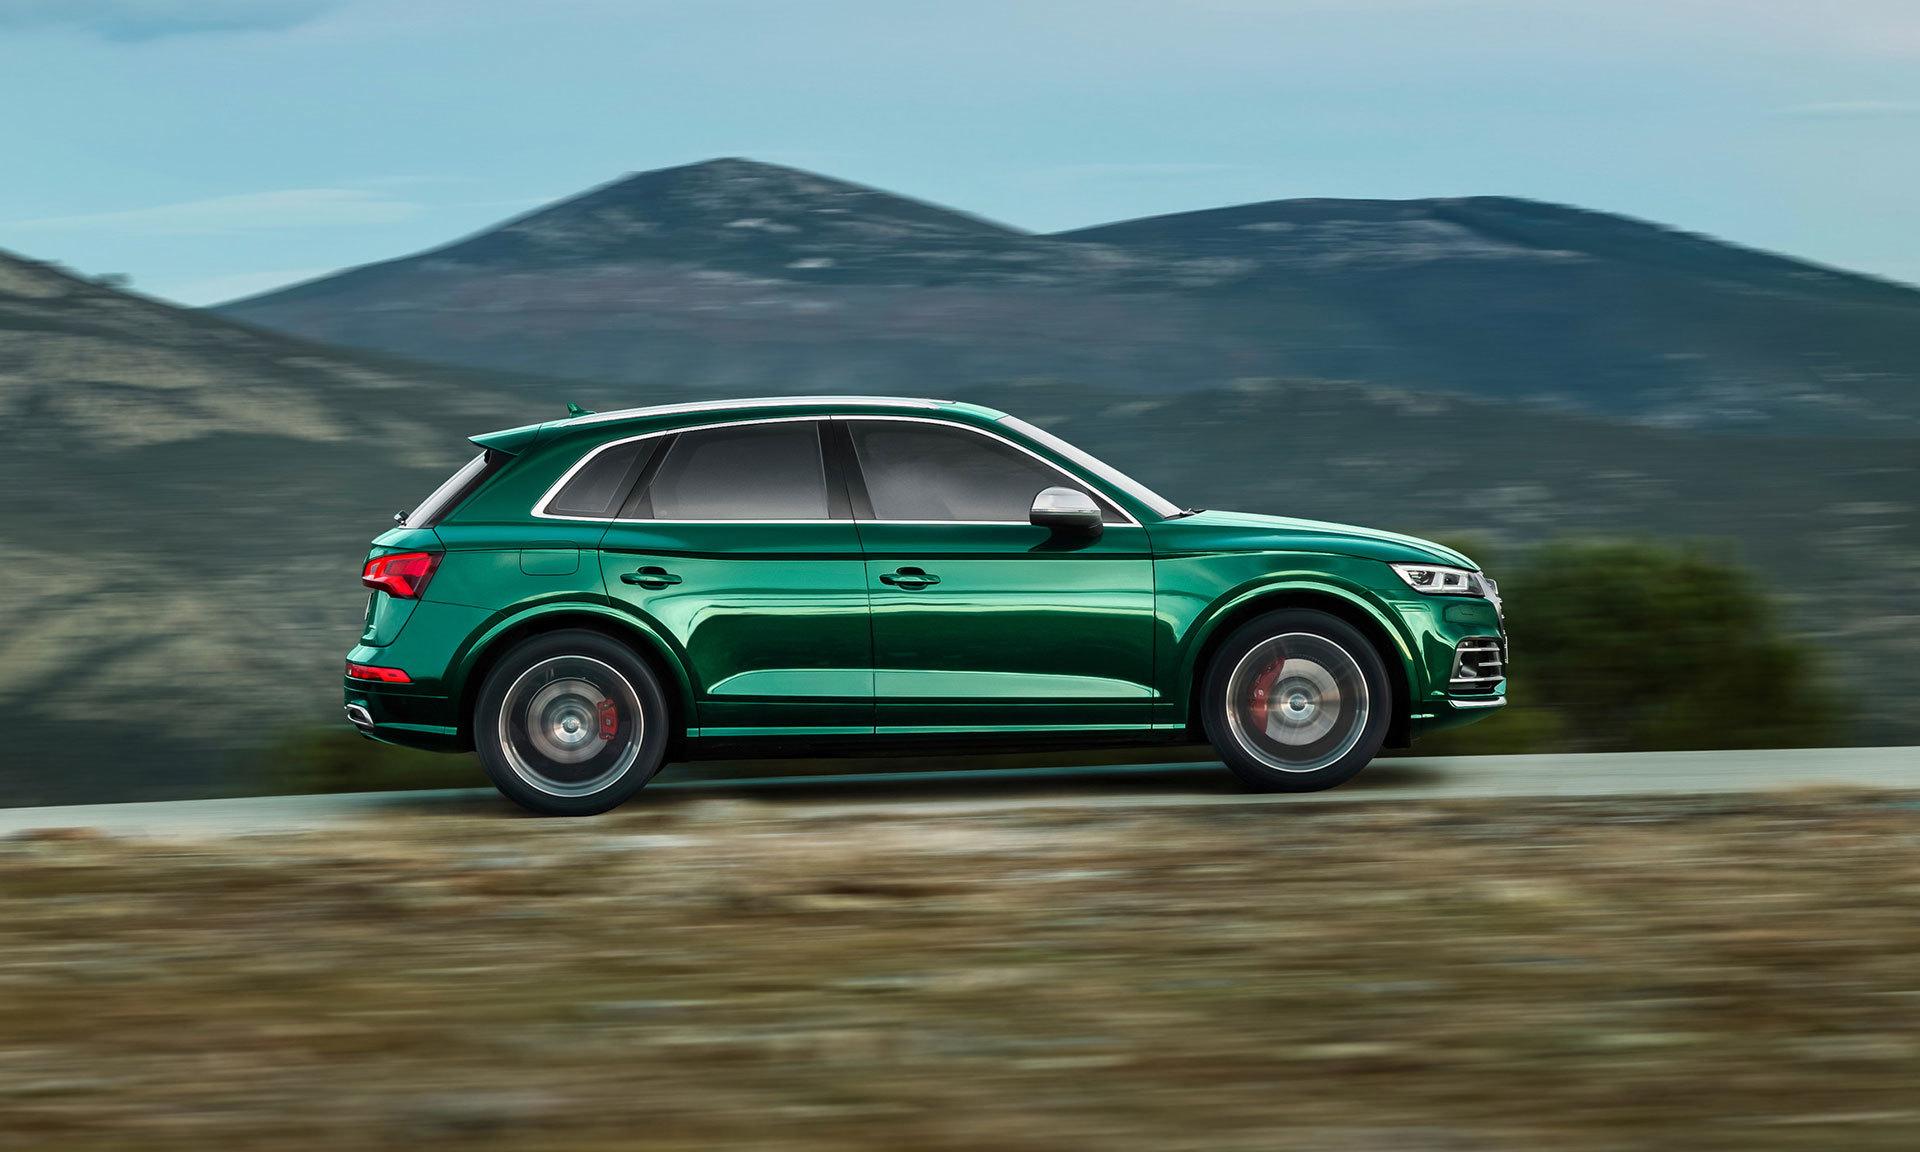 Impuesto De Matriculacion Coche Nuevo Audi Q3